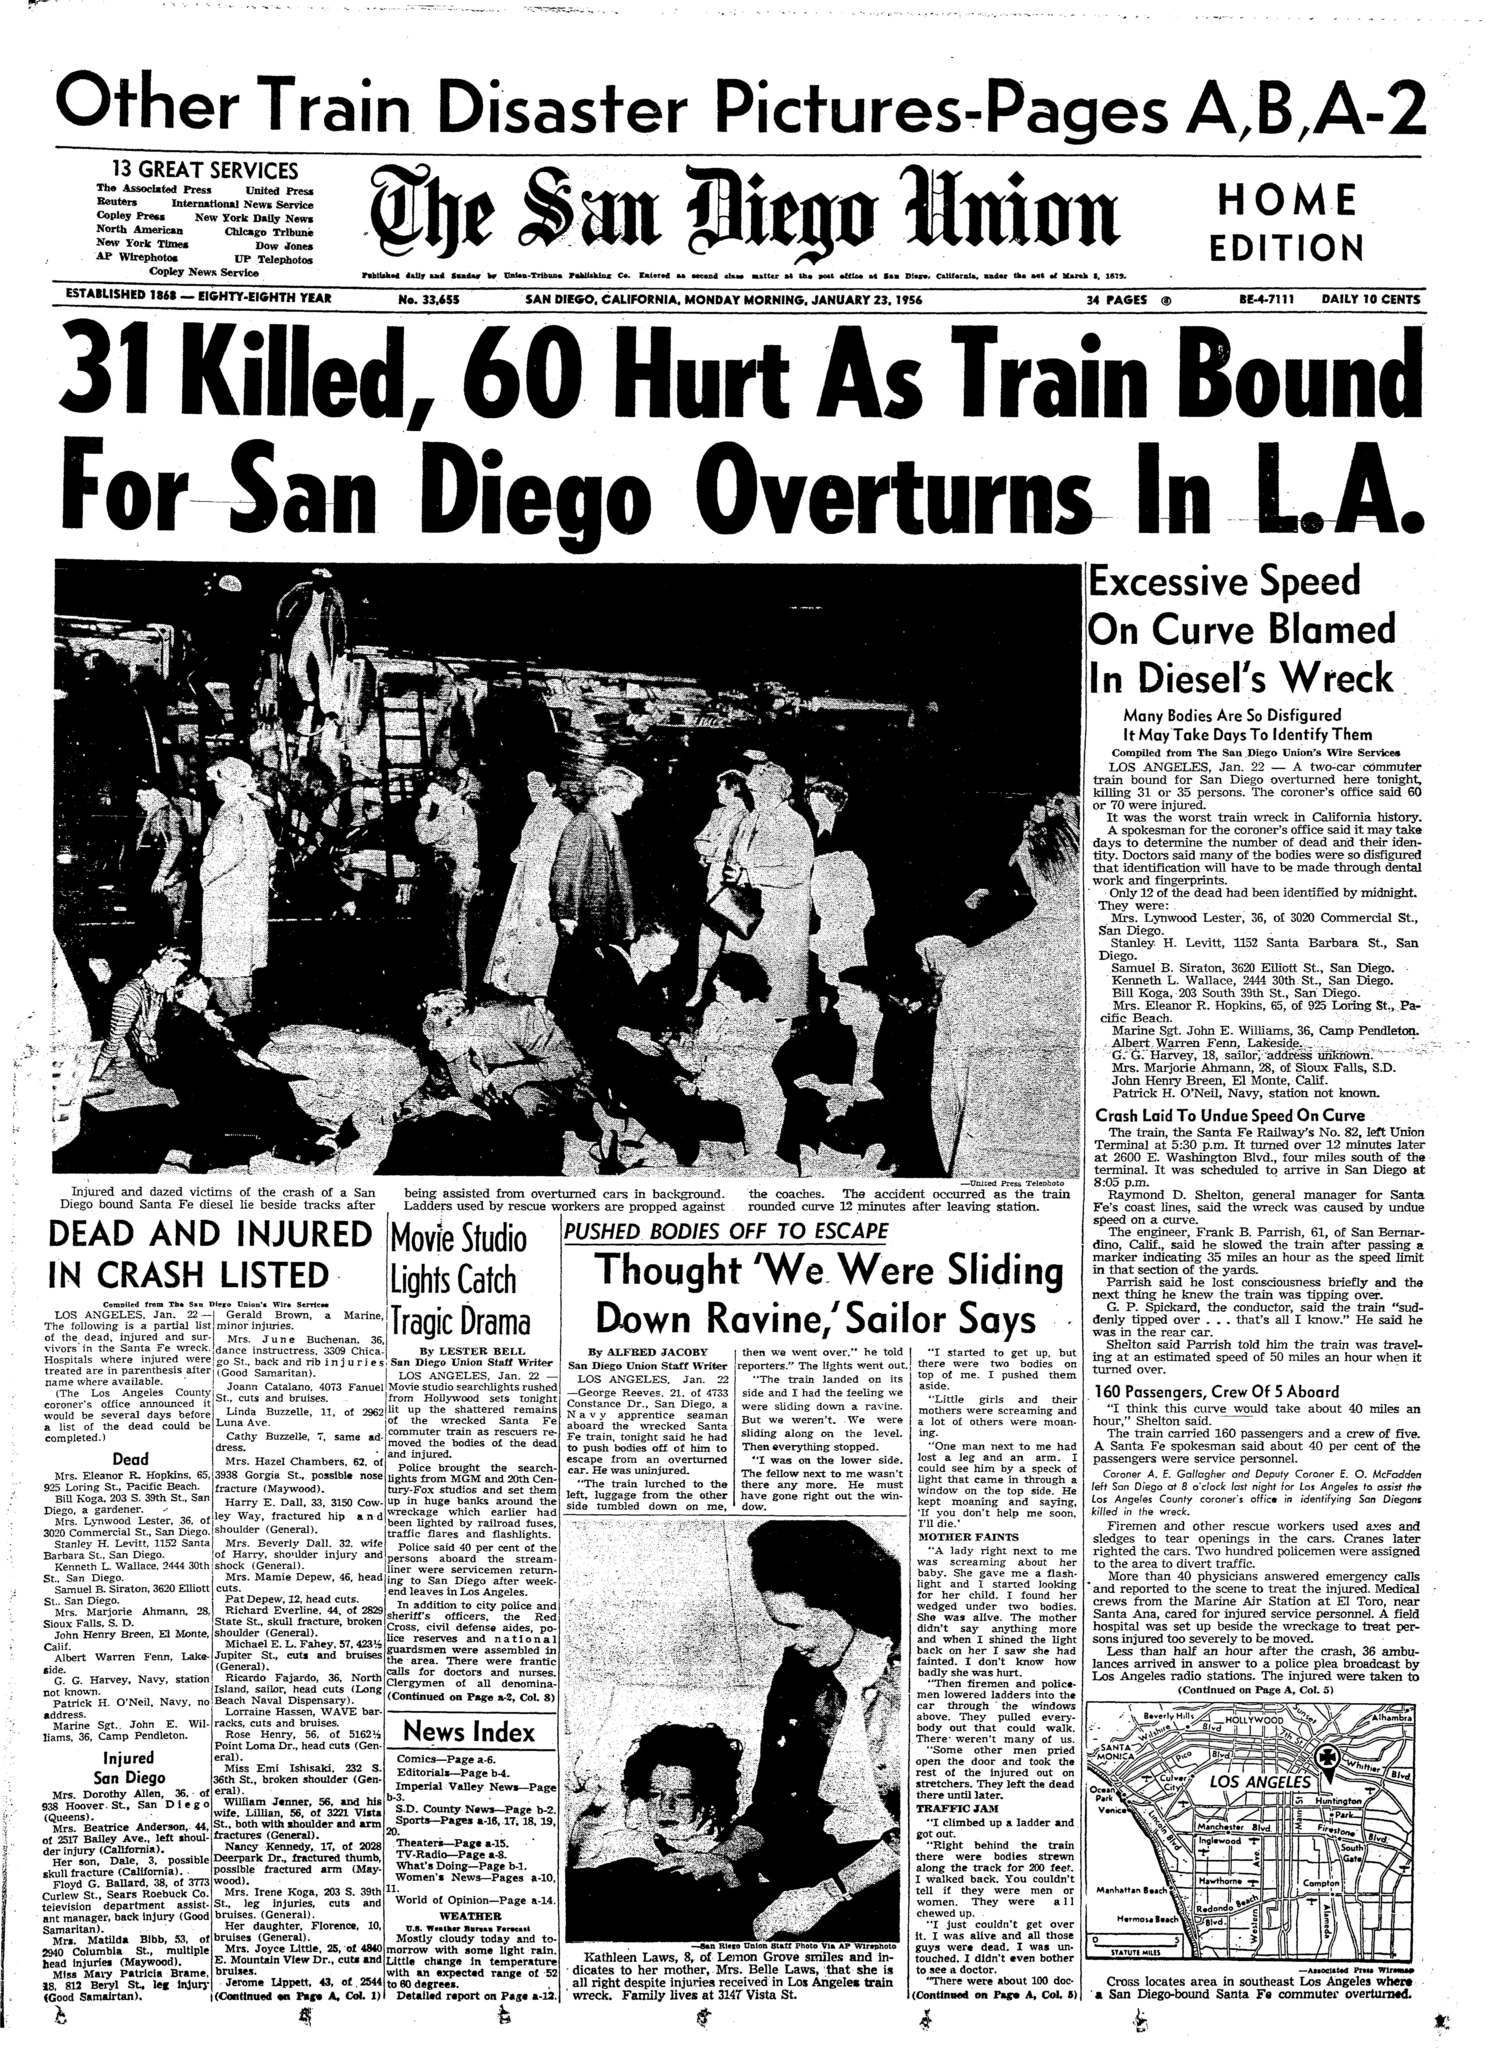 January 23, 1956